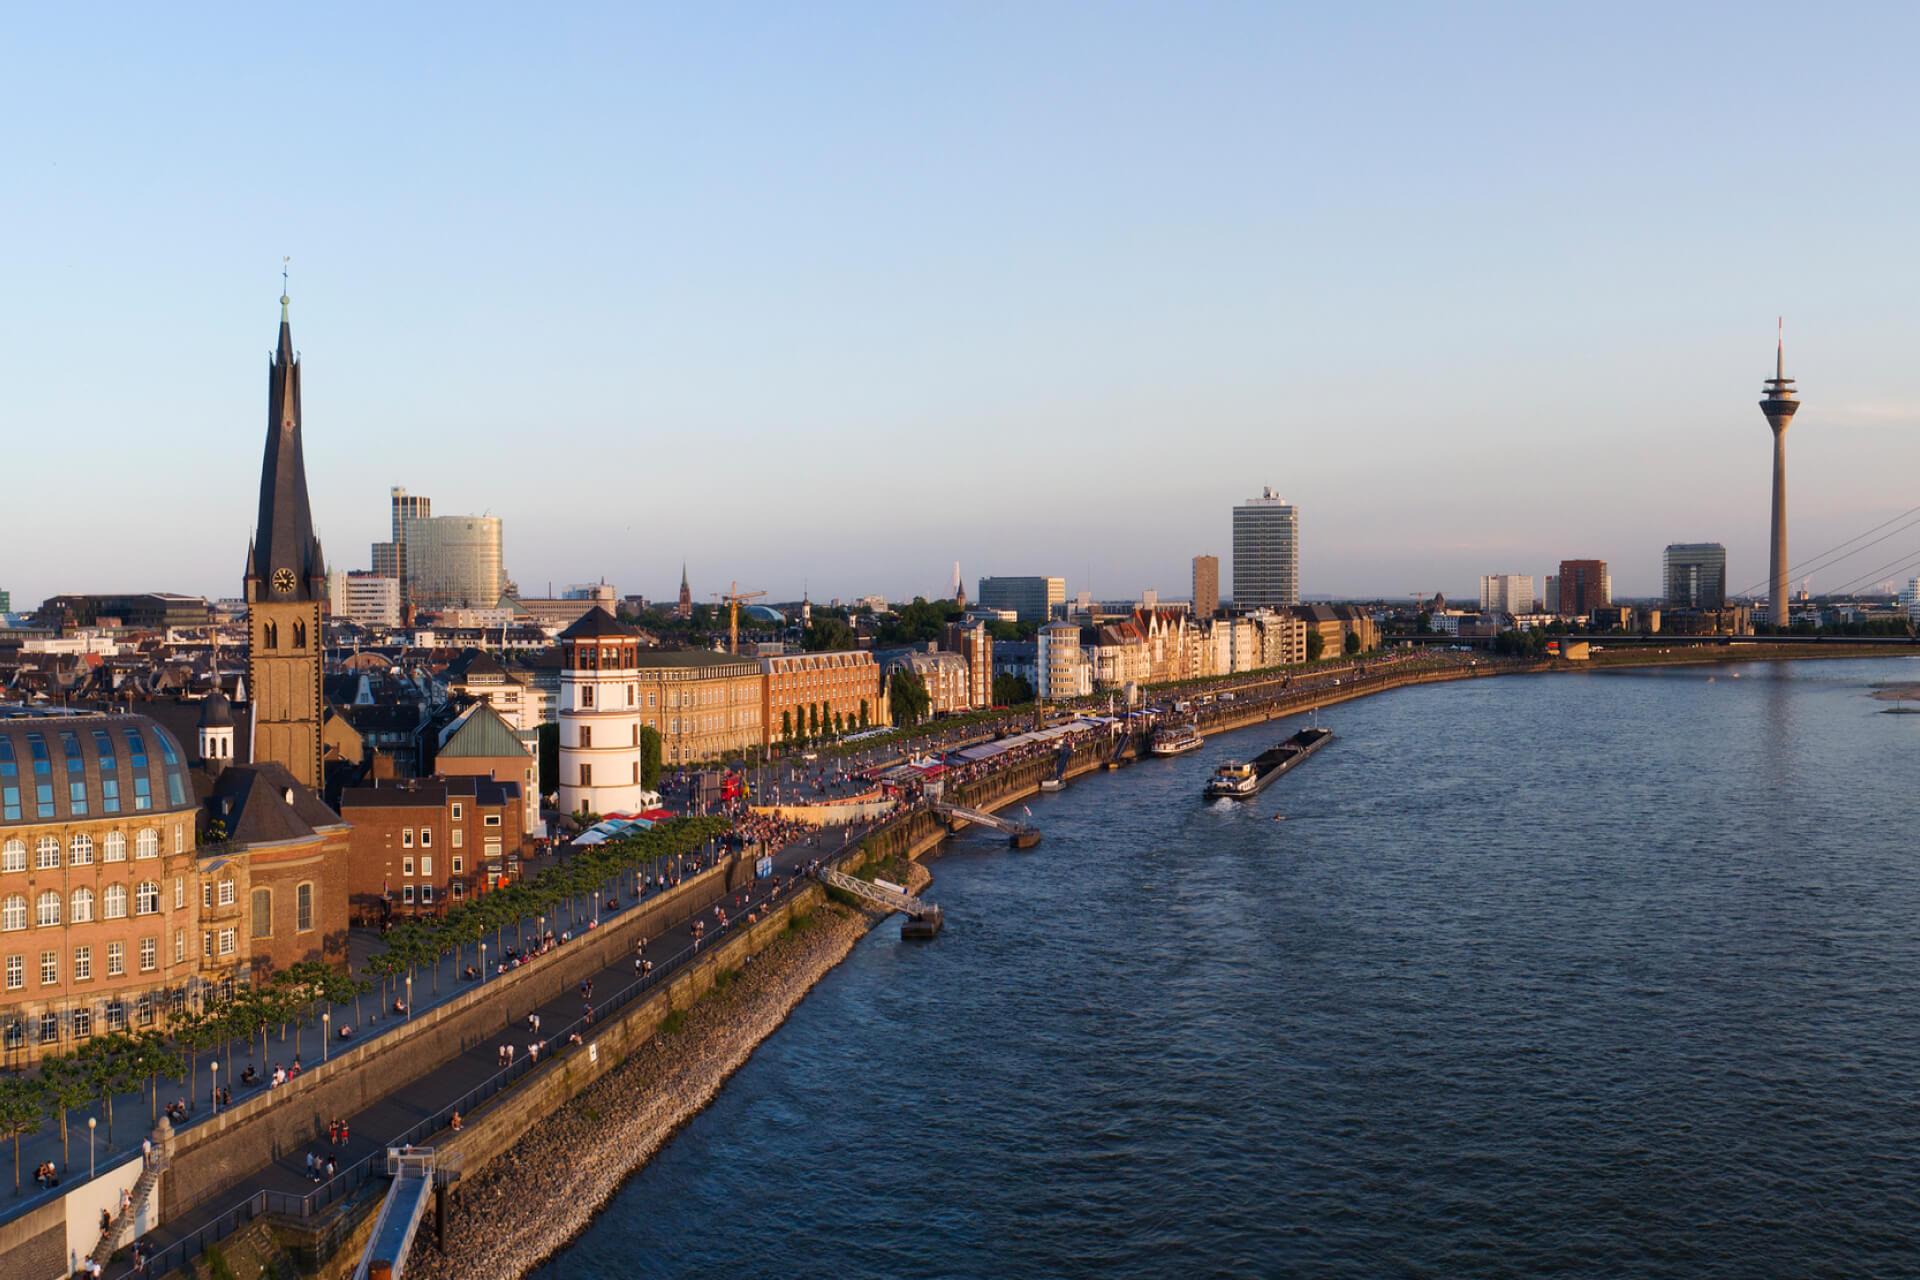 The Rhine River in Düsseldorf, Germany.